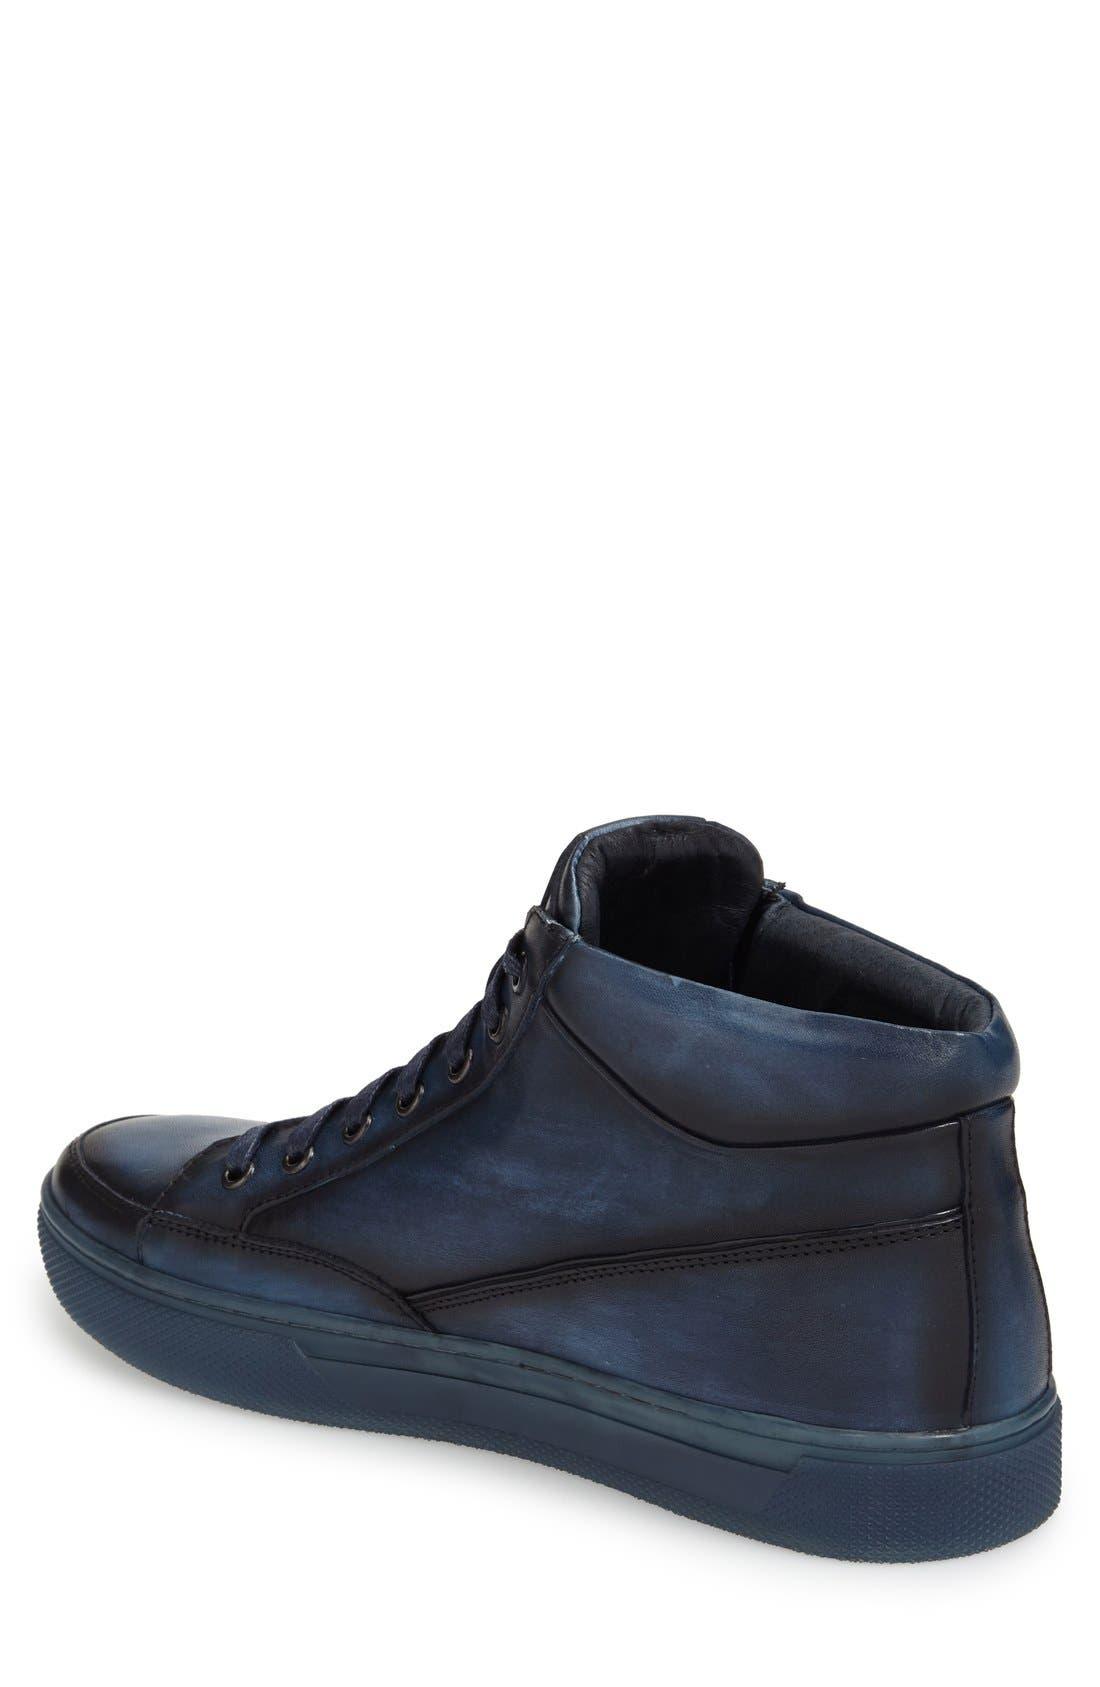 Alternate Image 2  - Jump 'Strickland' Sneaker (Men)